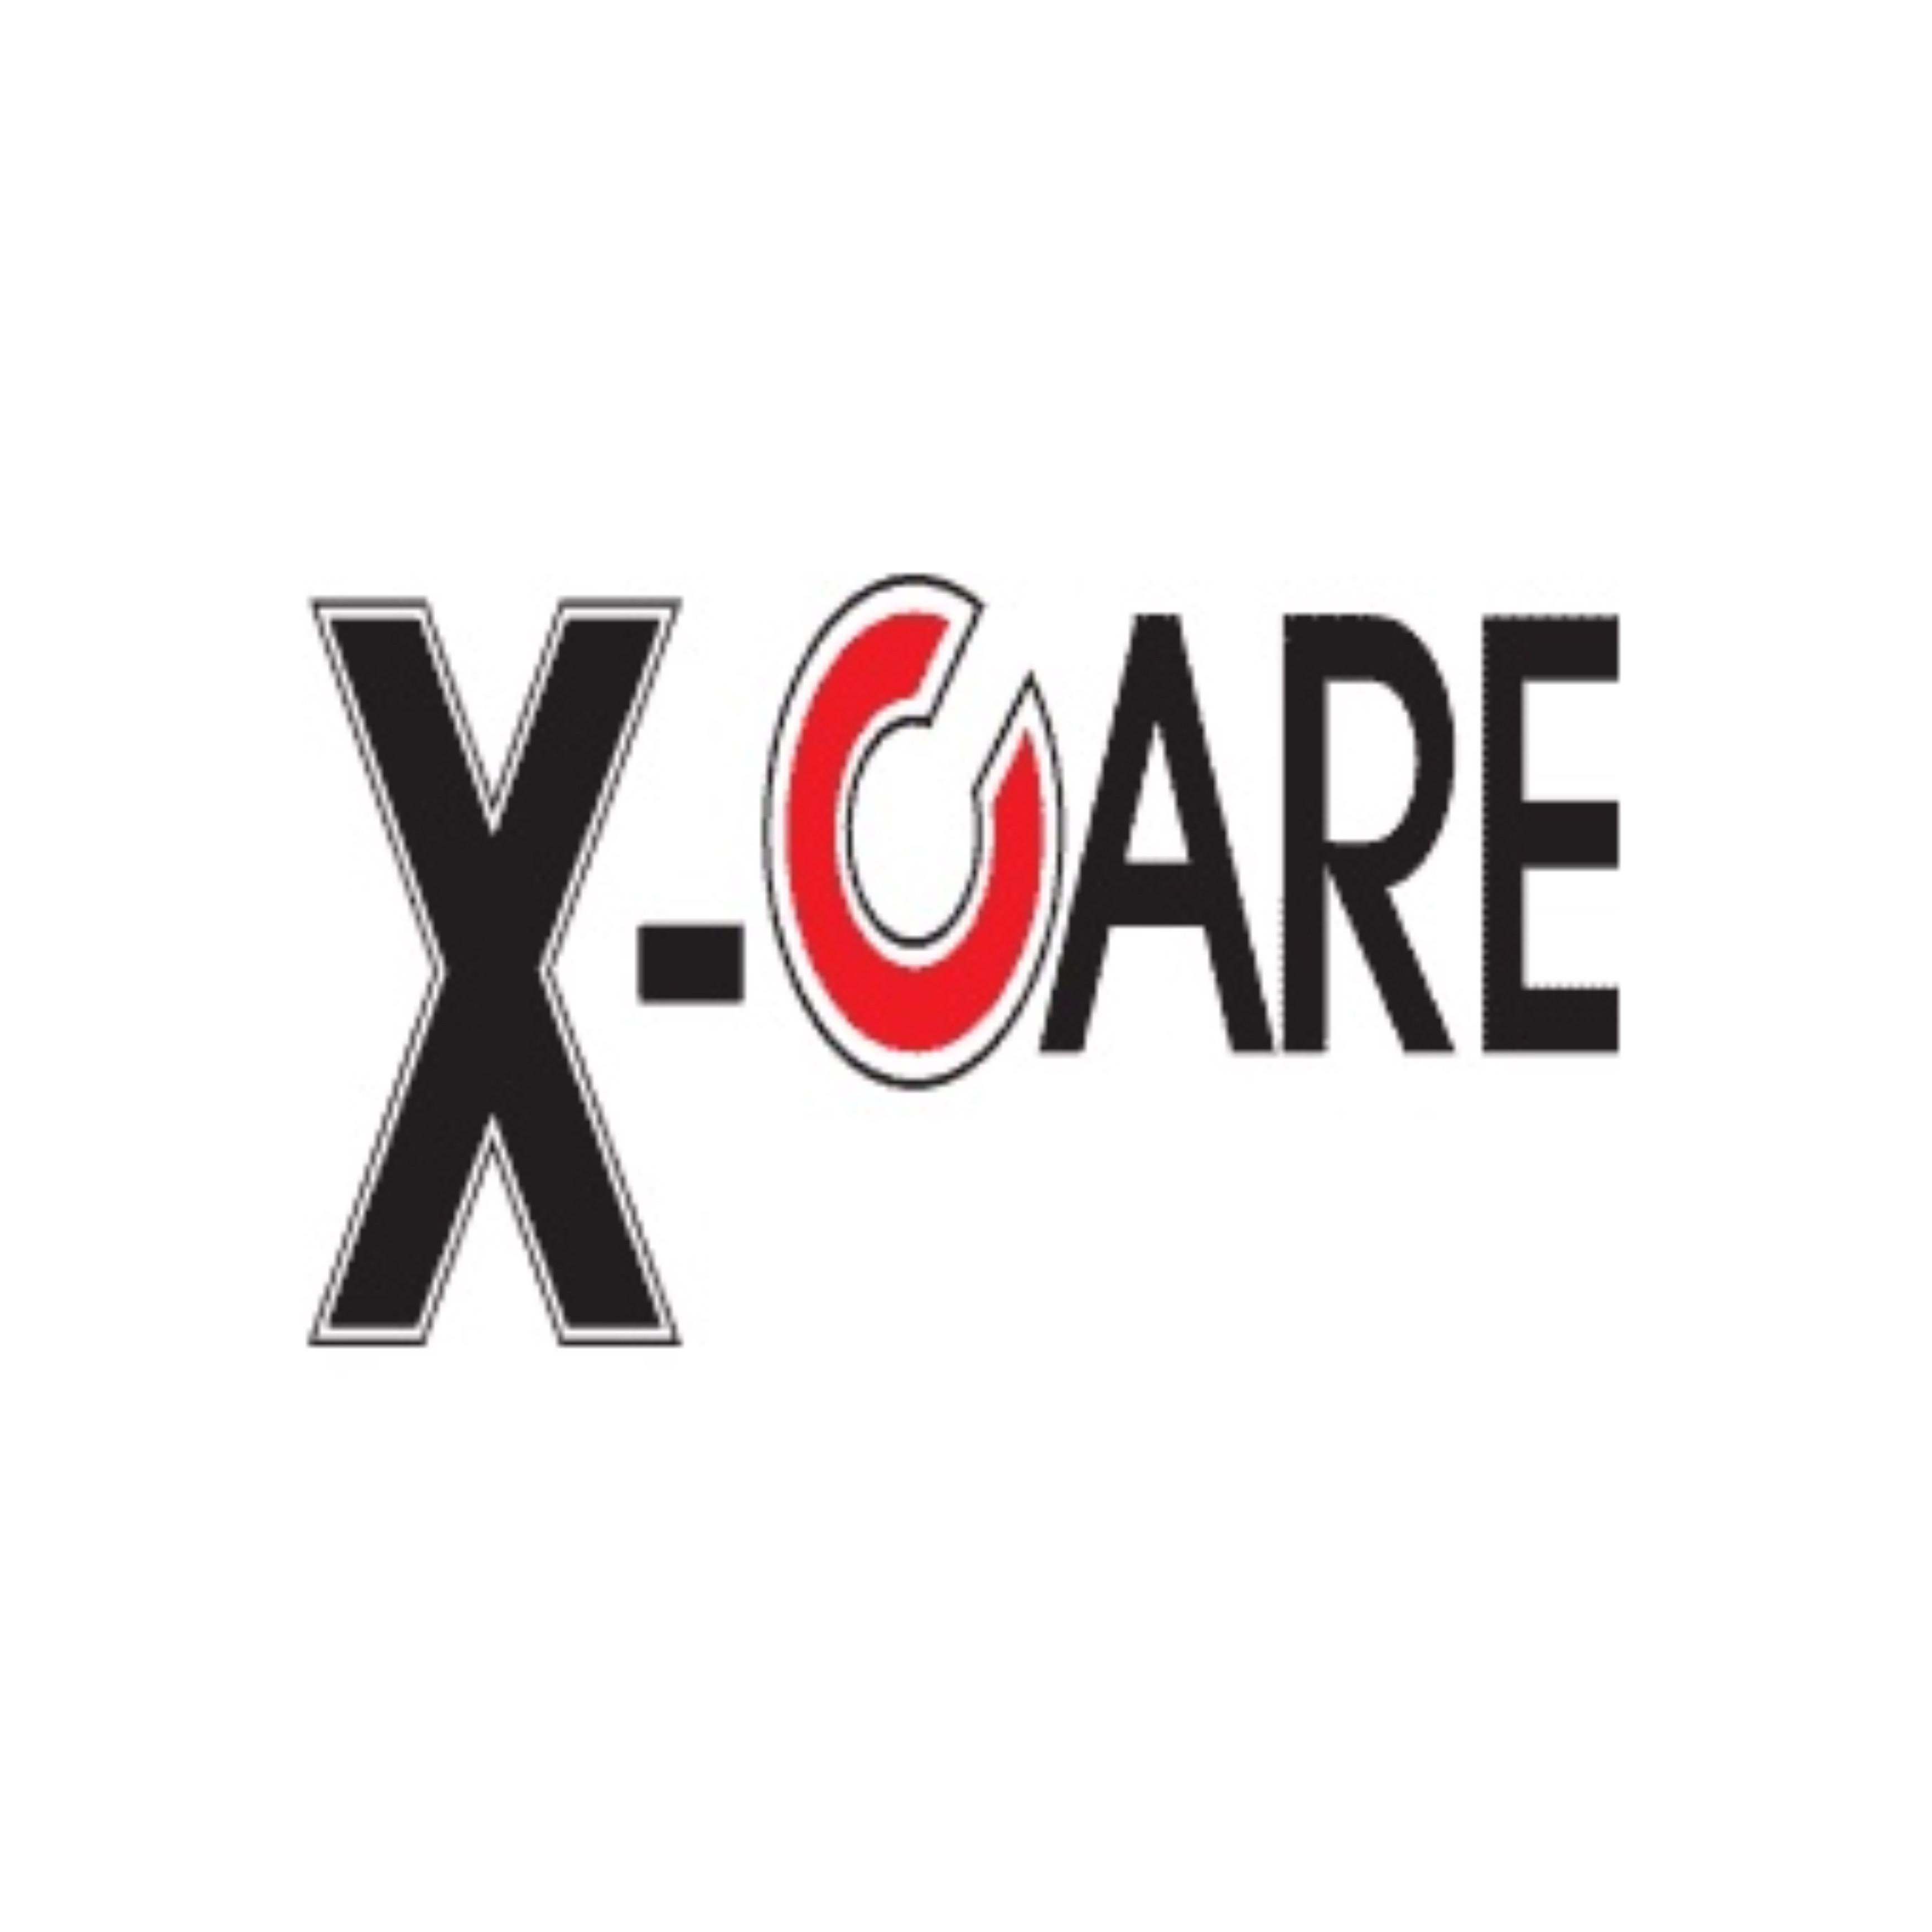 X-CARE